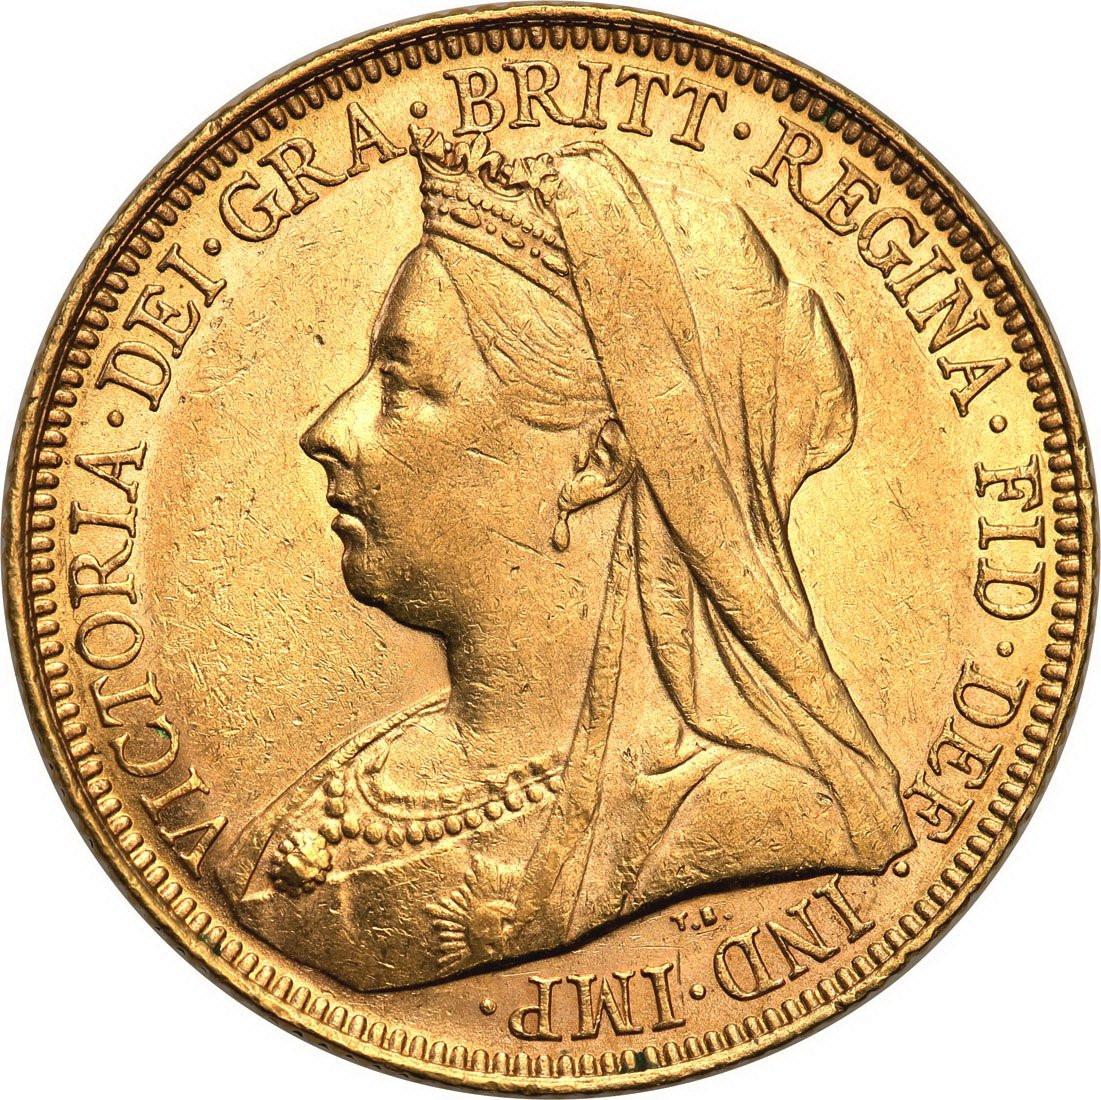 Wielka Brytania. Victoria 1 suweren 1900